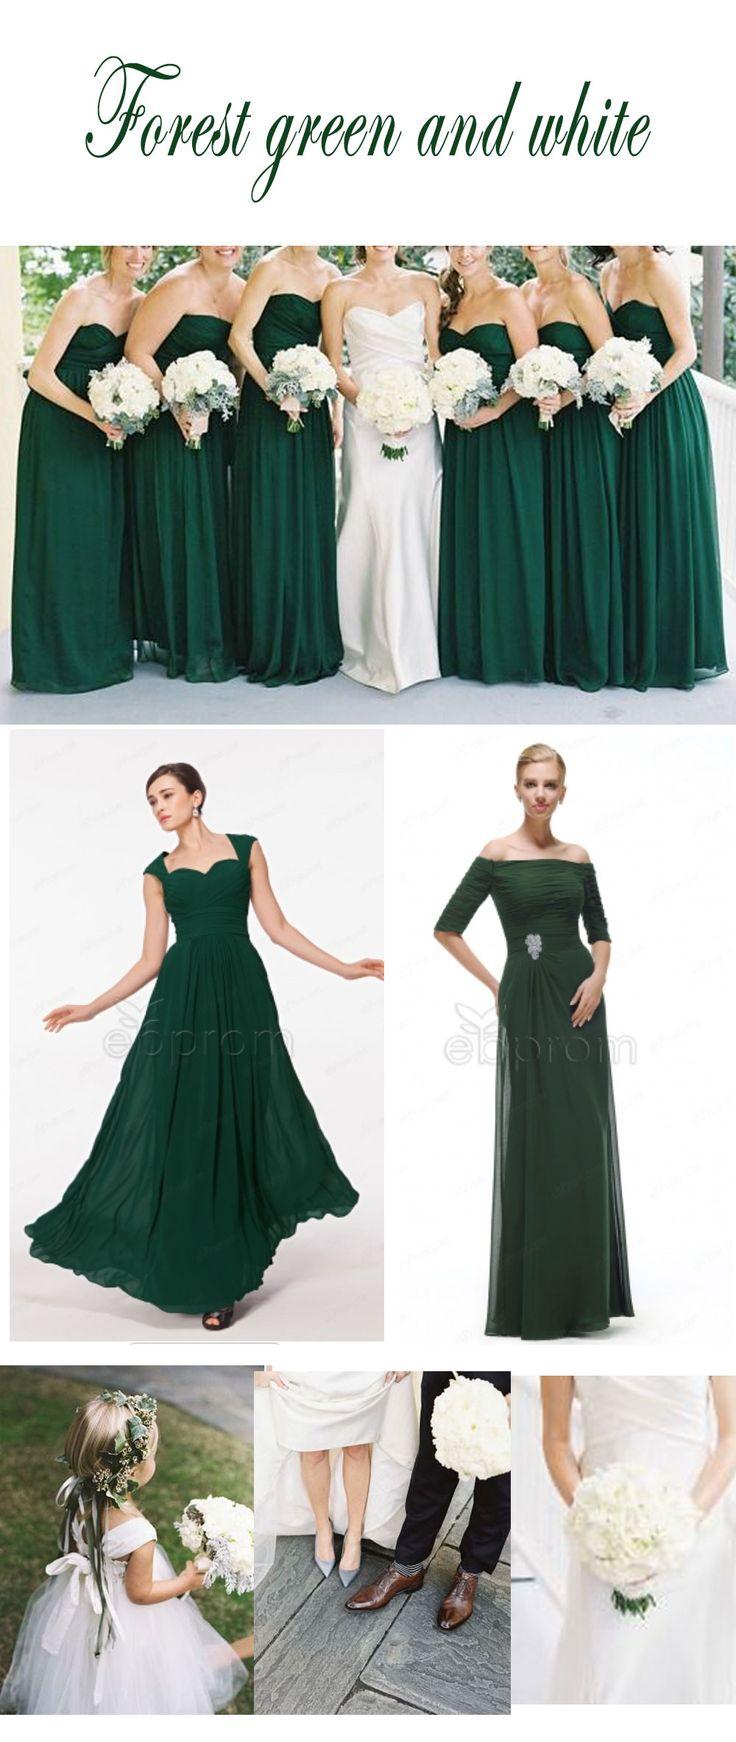 Best 25 forest green weddings ideas on pinterest forest for Forest green wedding dress